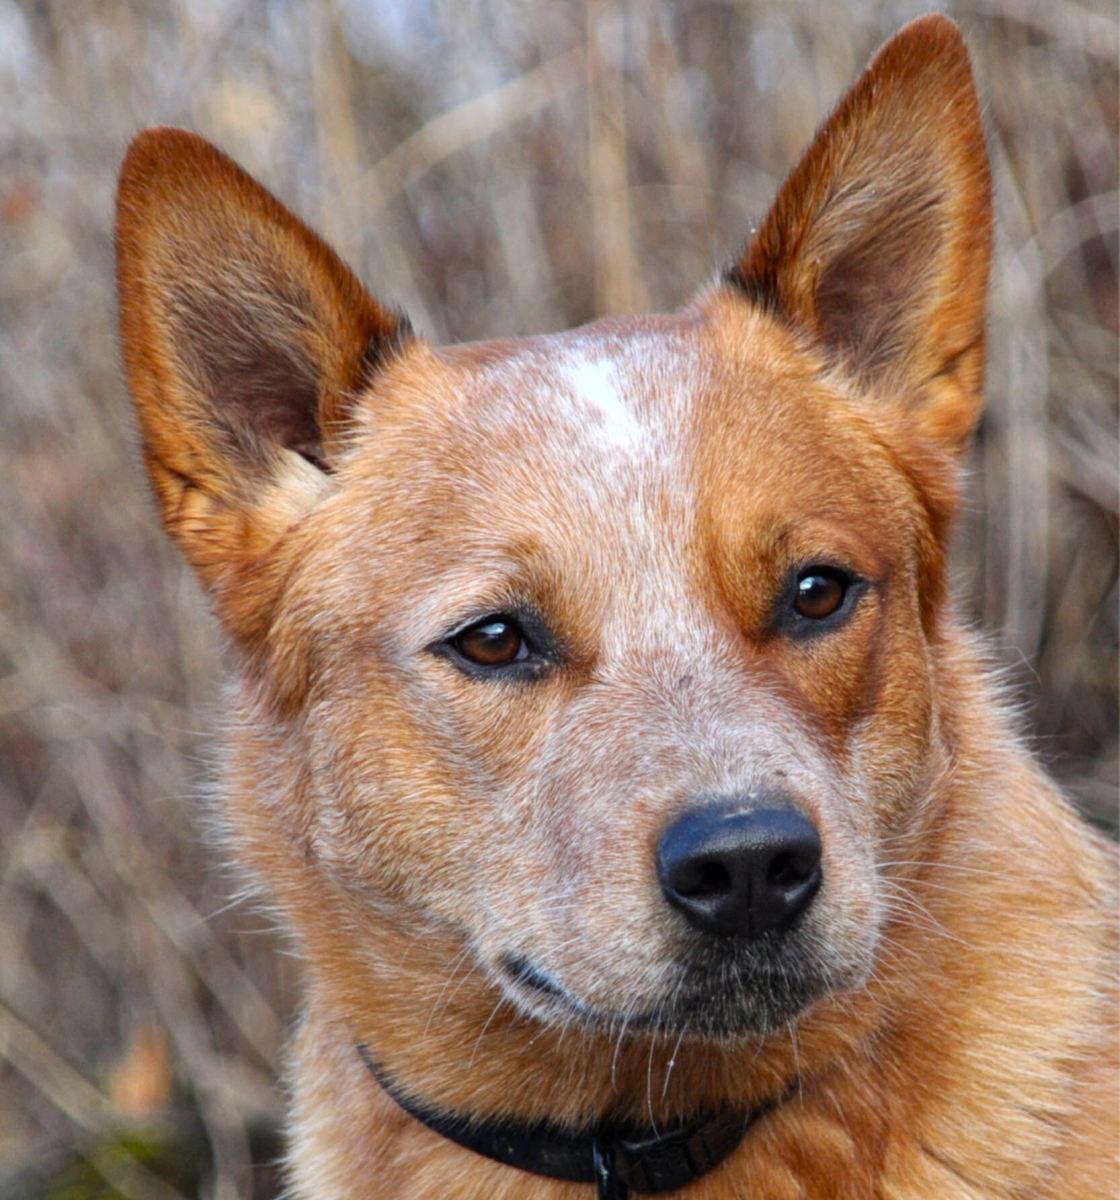 An Australian Cattle Dog's head.